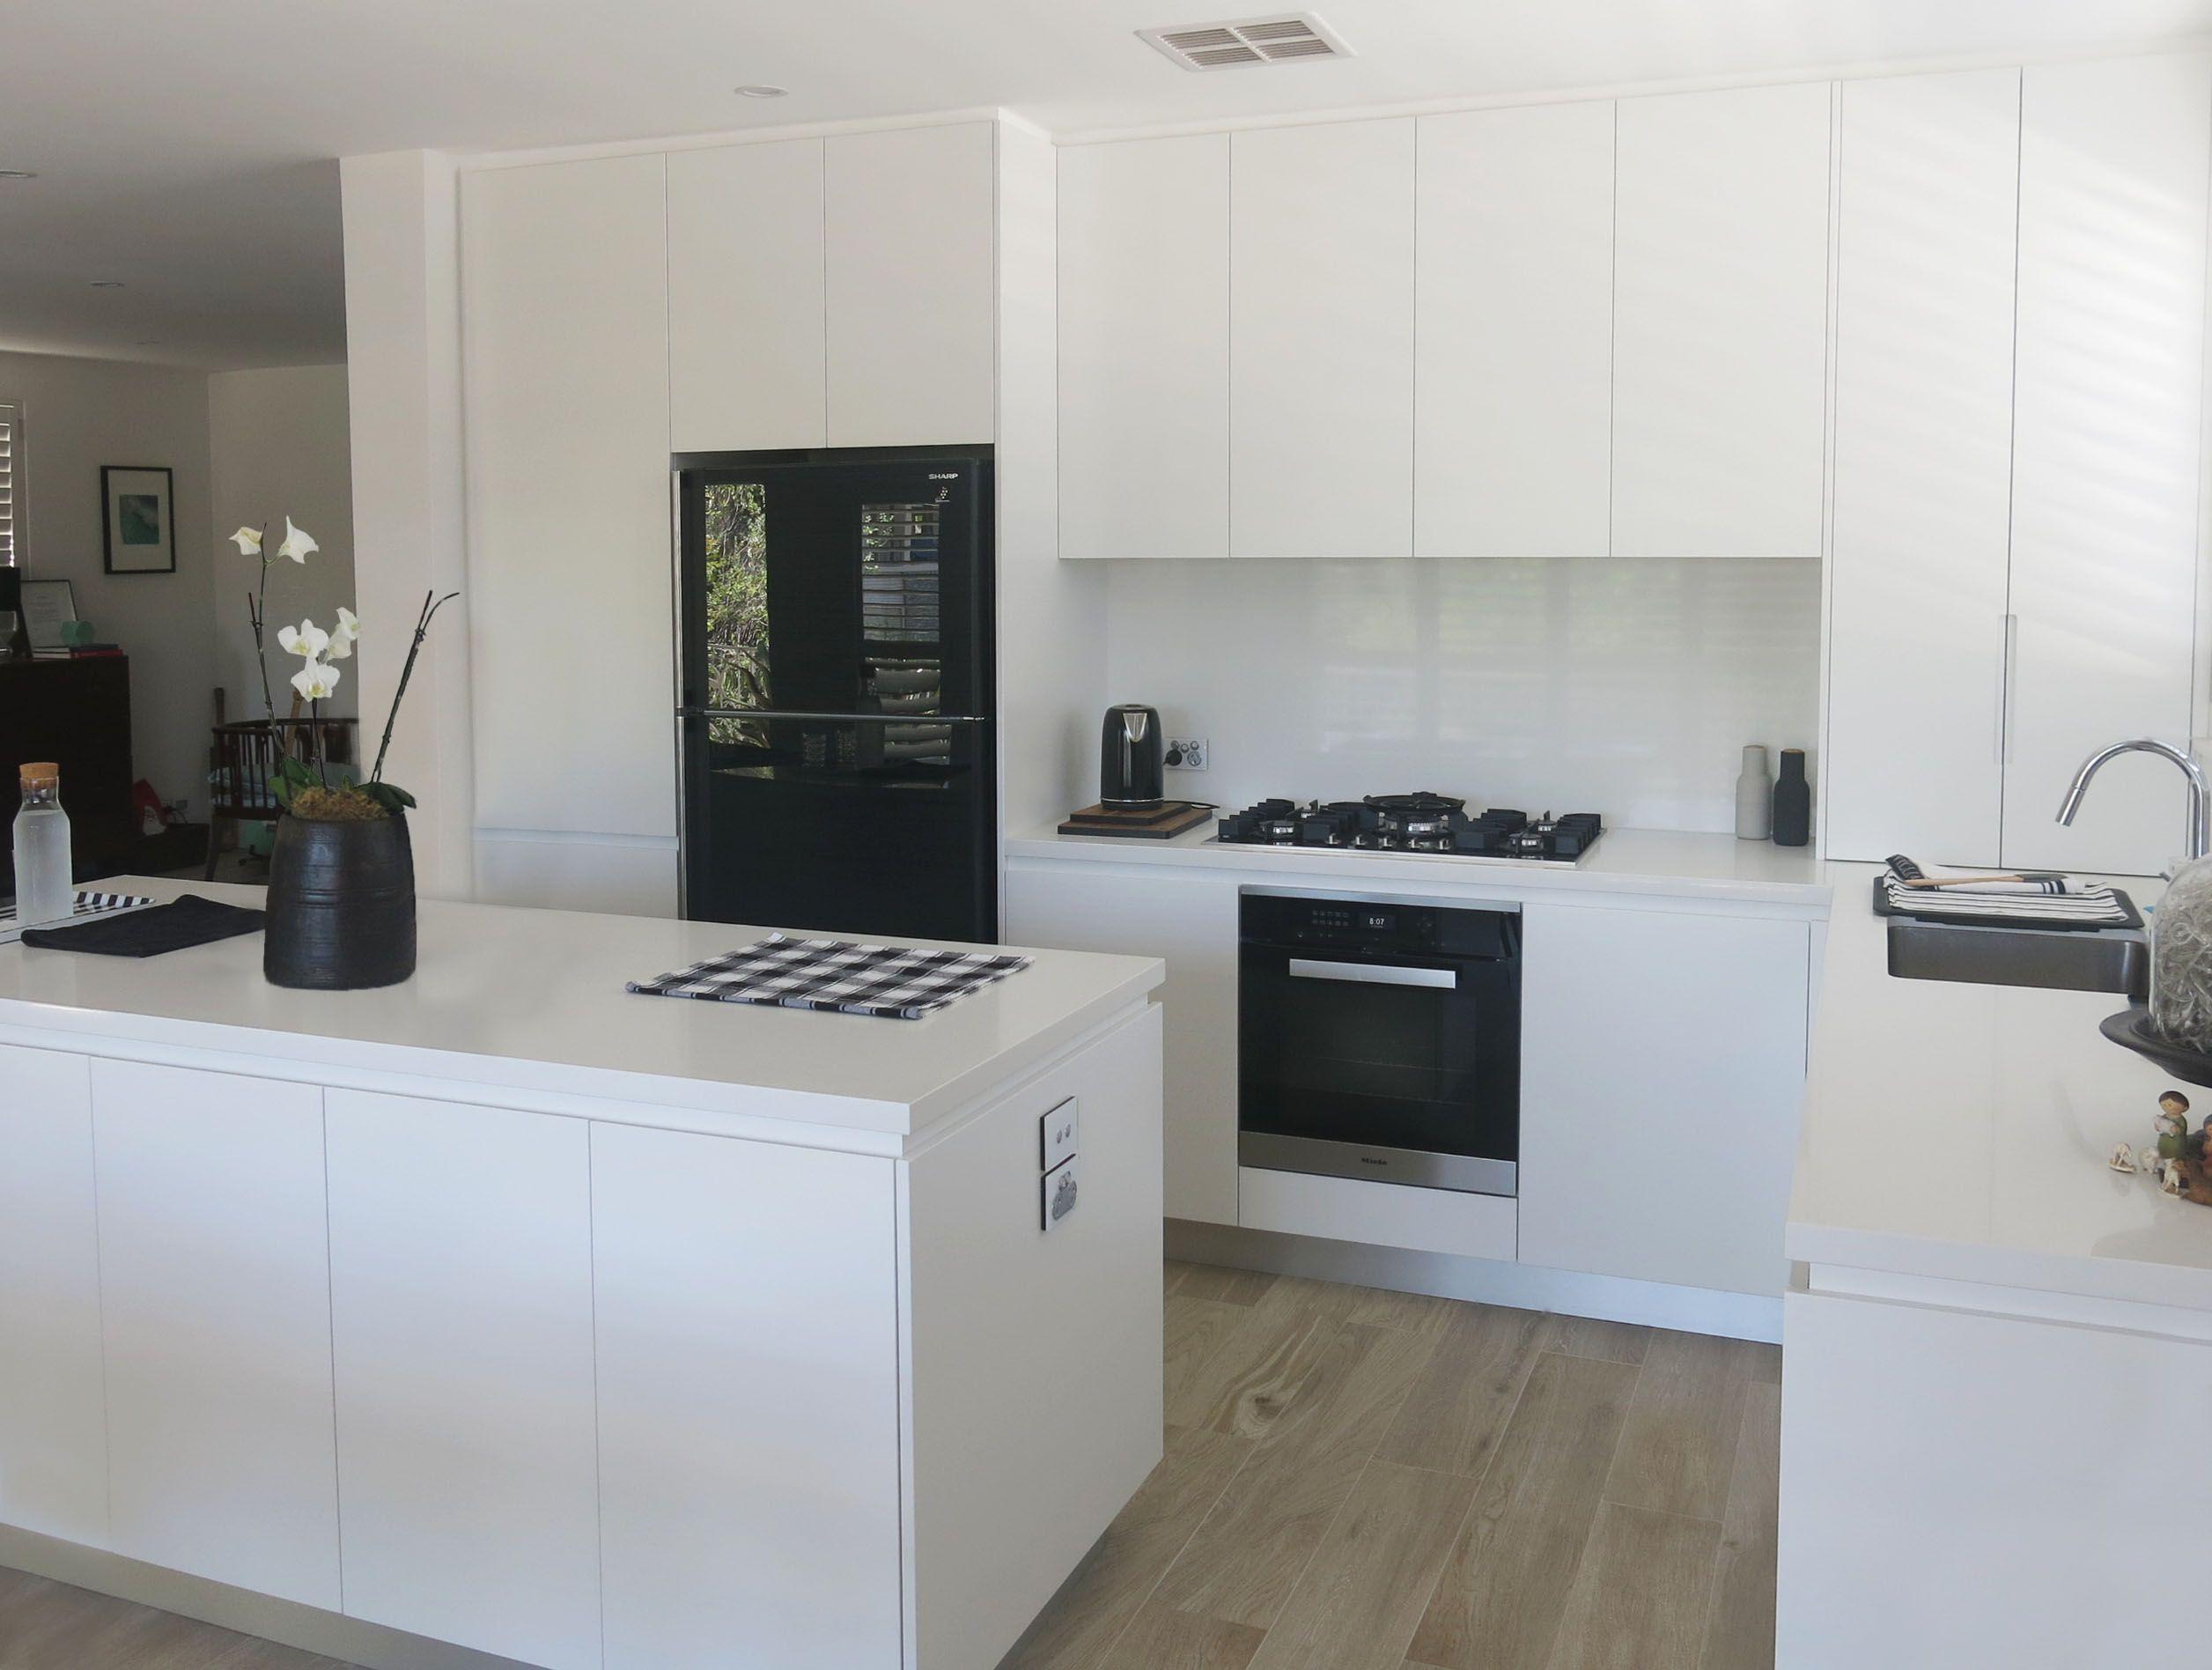 Download Wallpaper White Gloss Kitchen No Handles